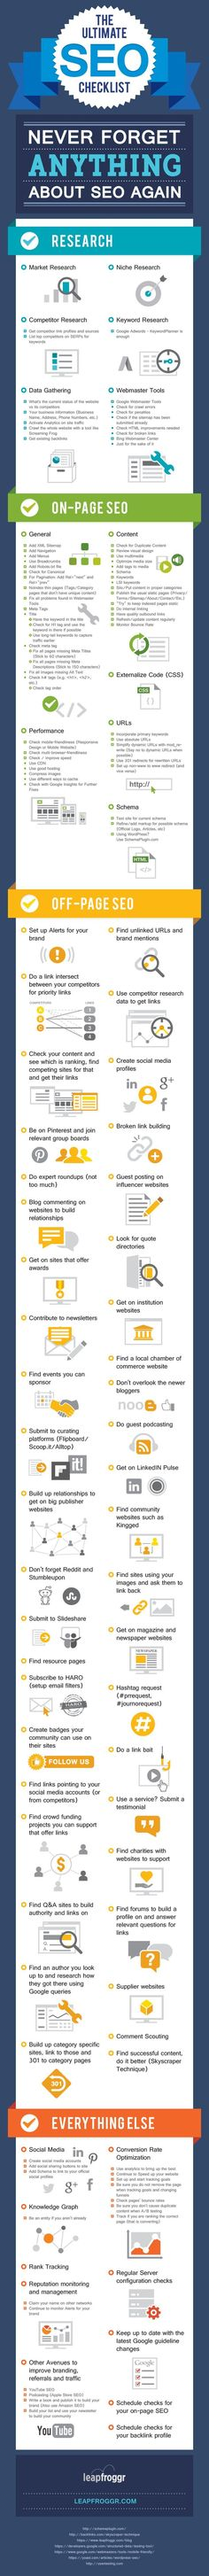 El checklist de SEO definitivo https://www.leapfroggr.com/seo-checklist/